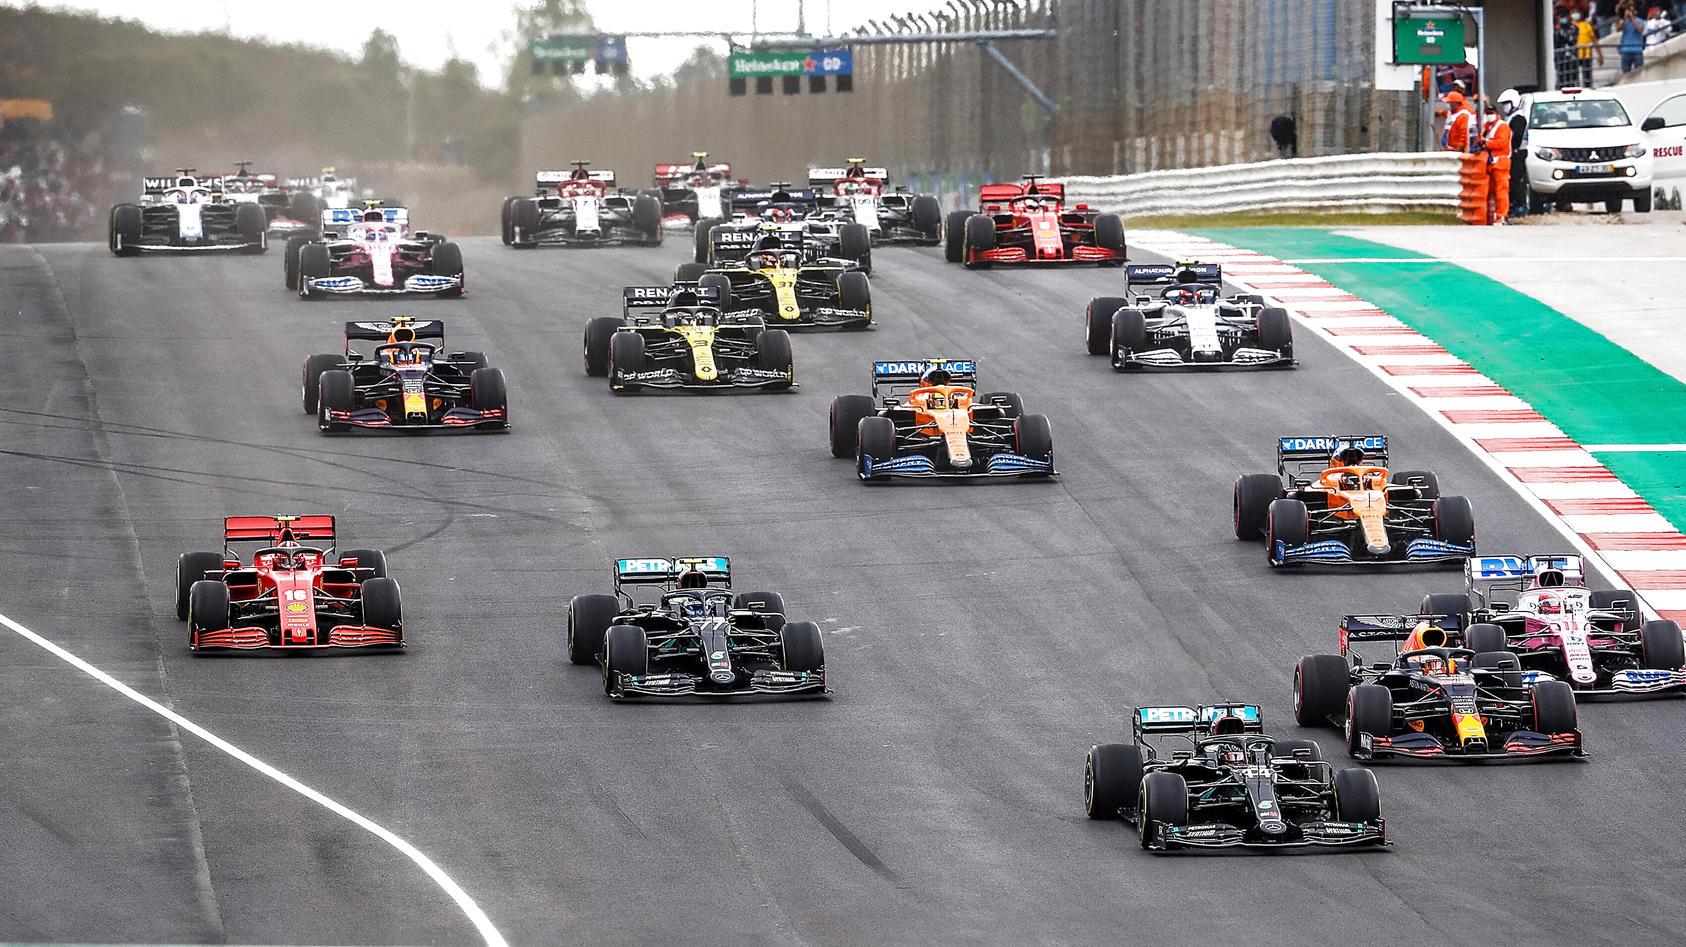 Die Formel 1 in Portimao